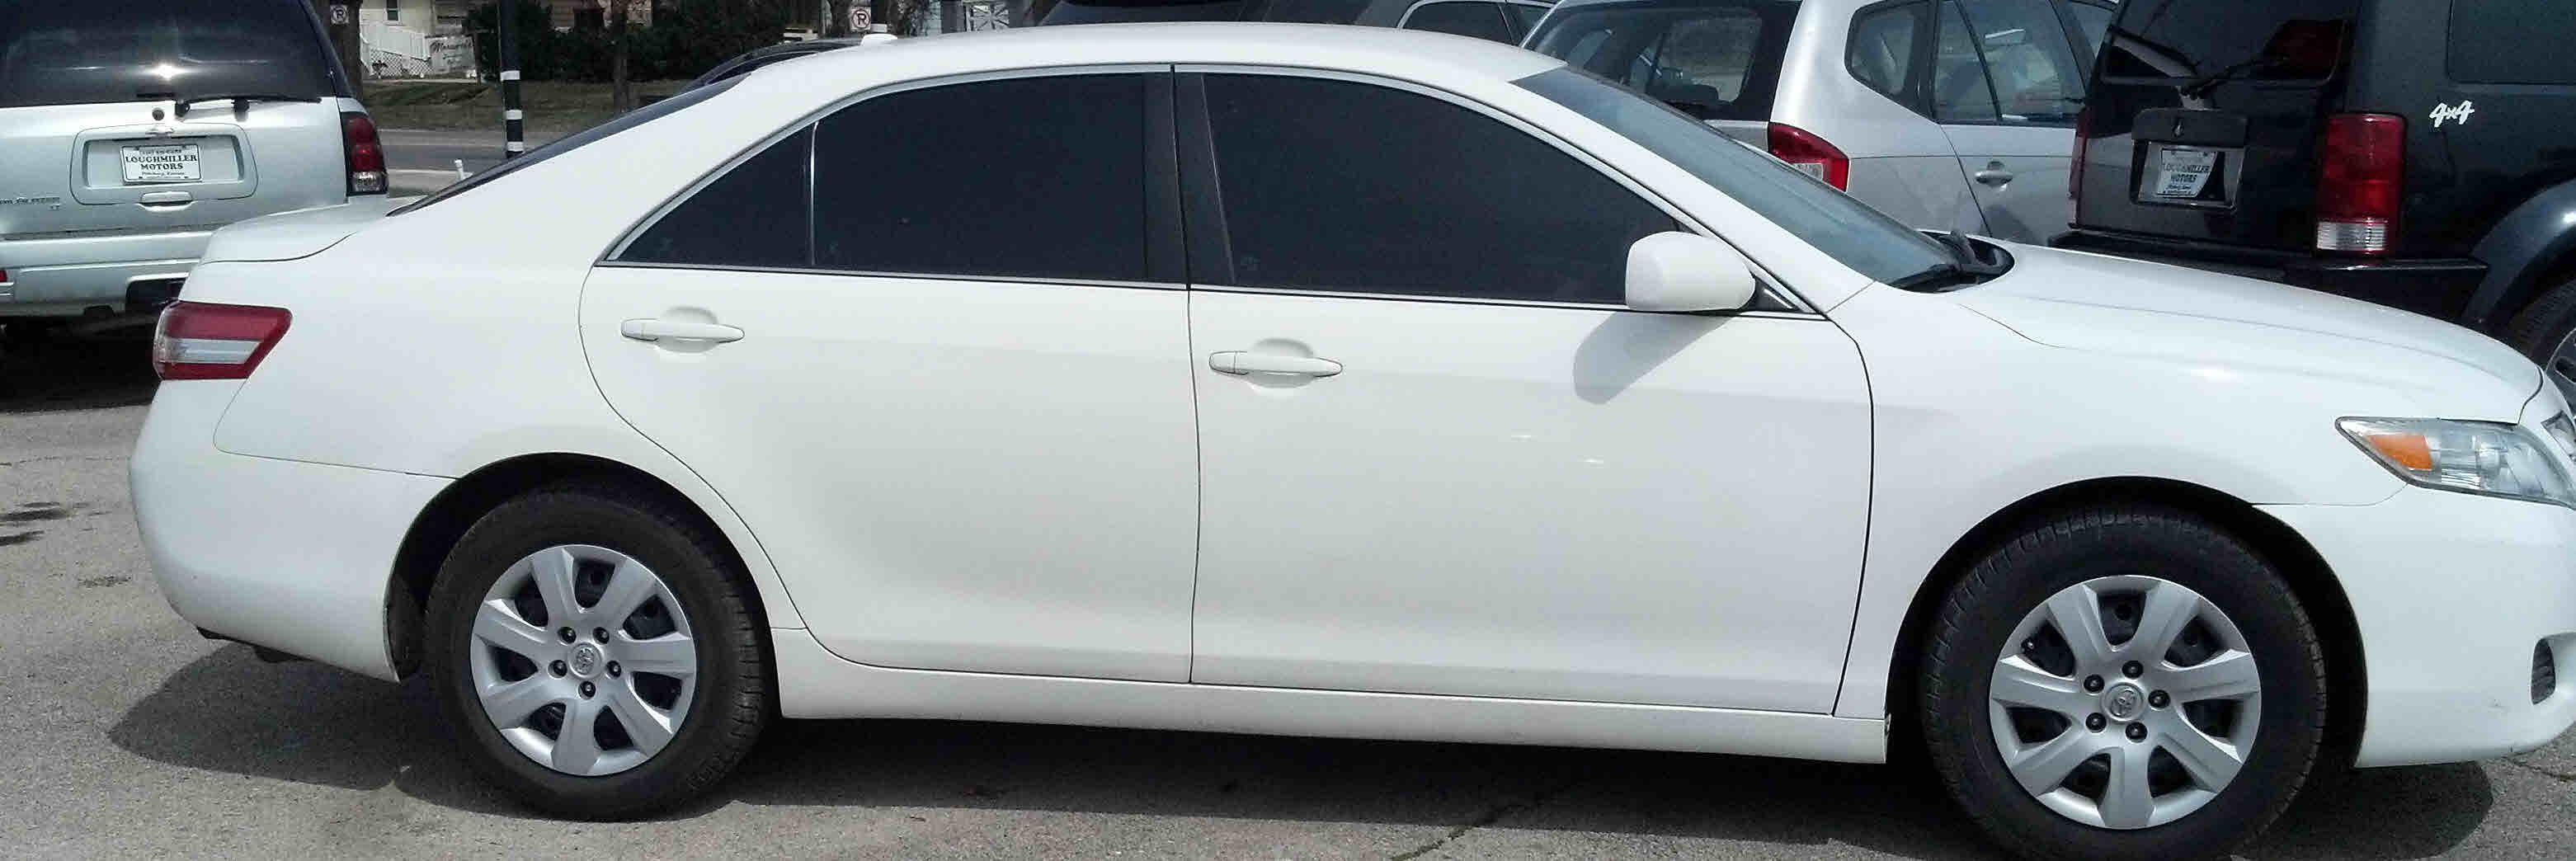 Name for a white car carsjp loughmiller motors publicscrutiny Choice Image